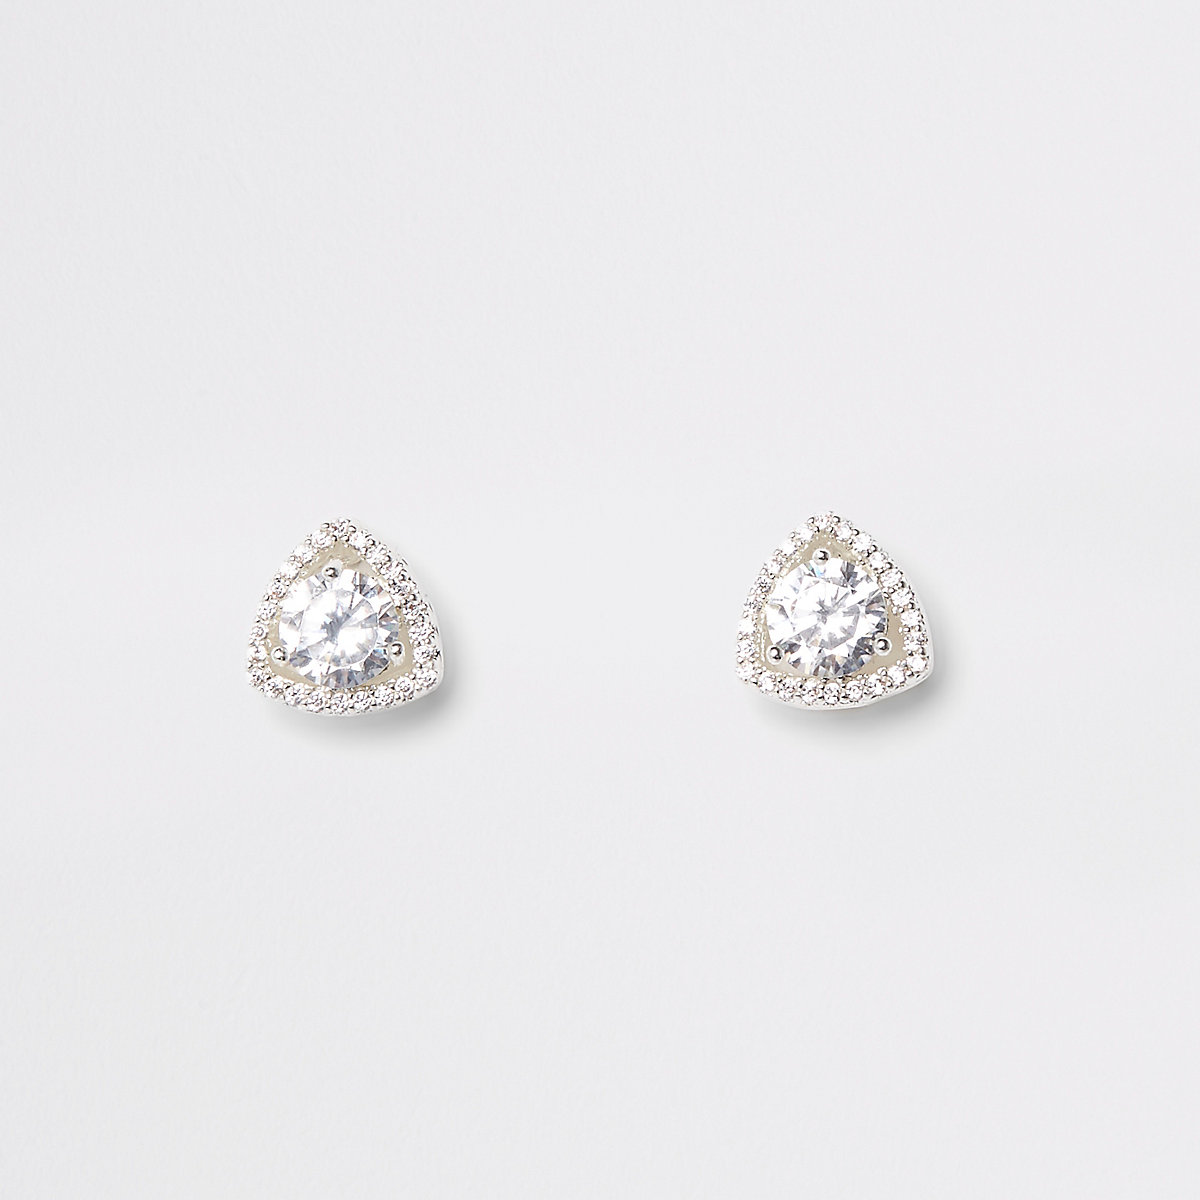 Silver plate cubic zirconia triangle earrings